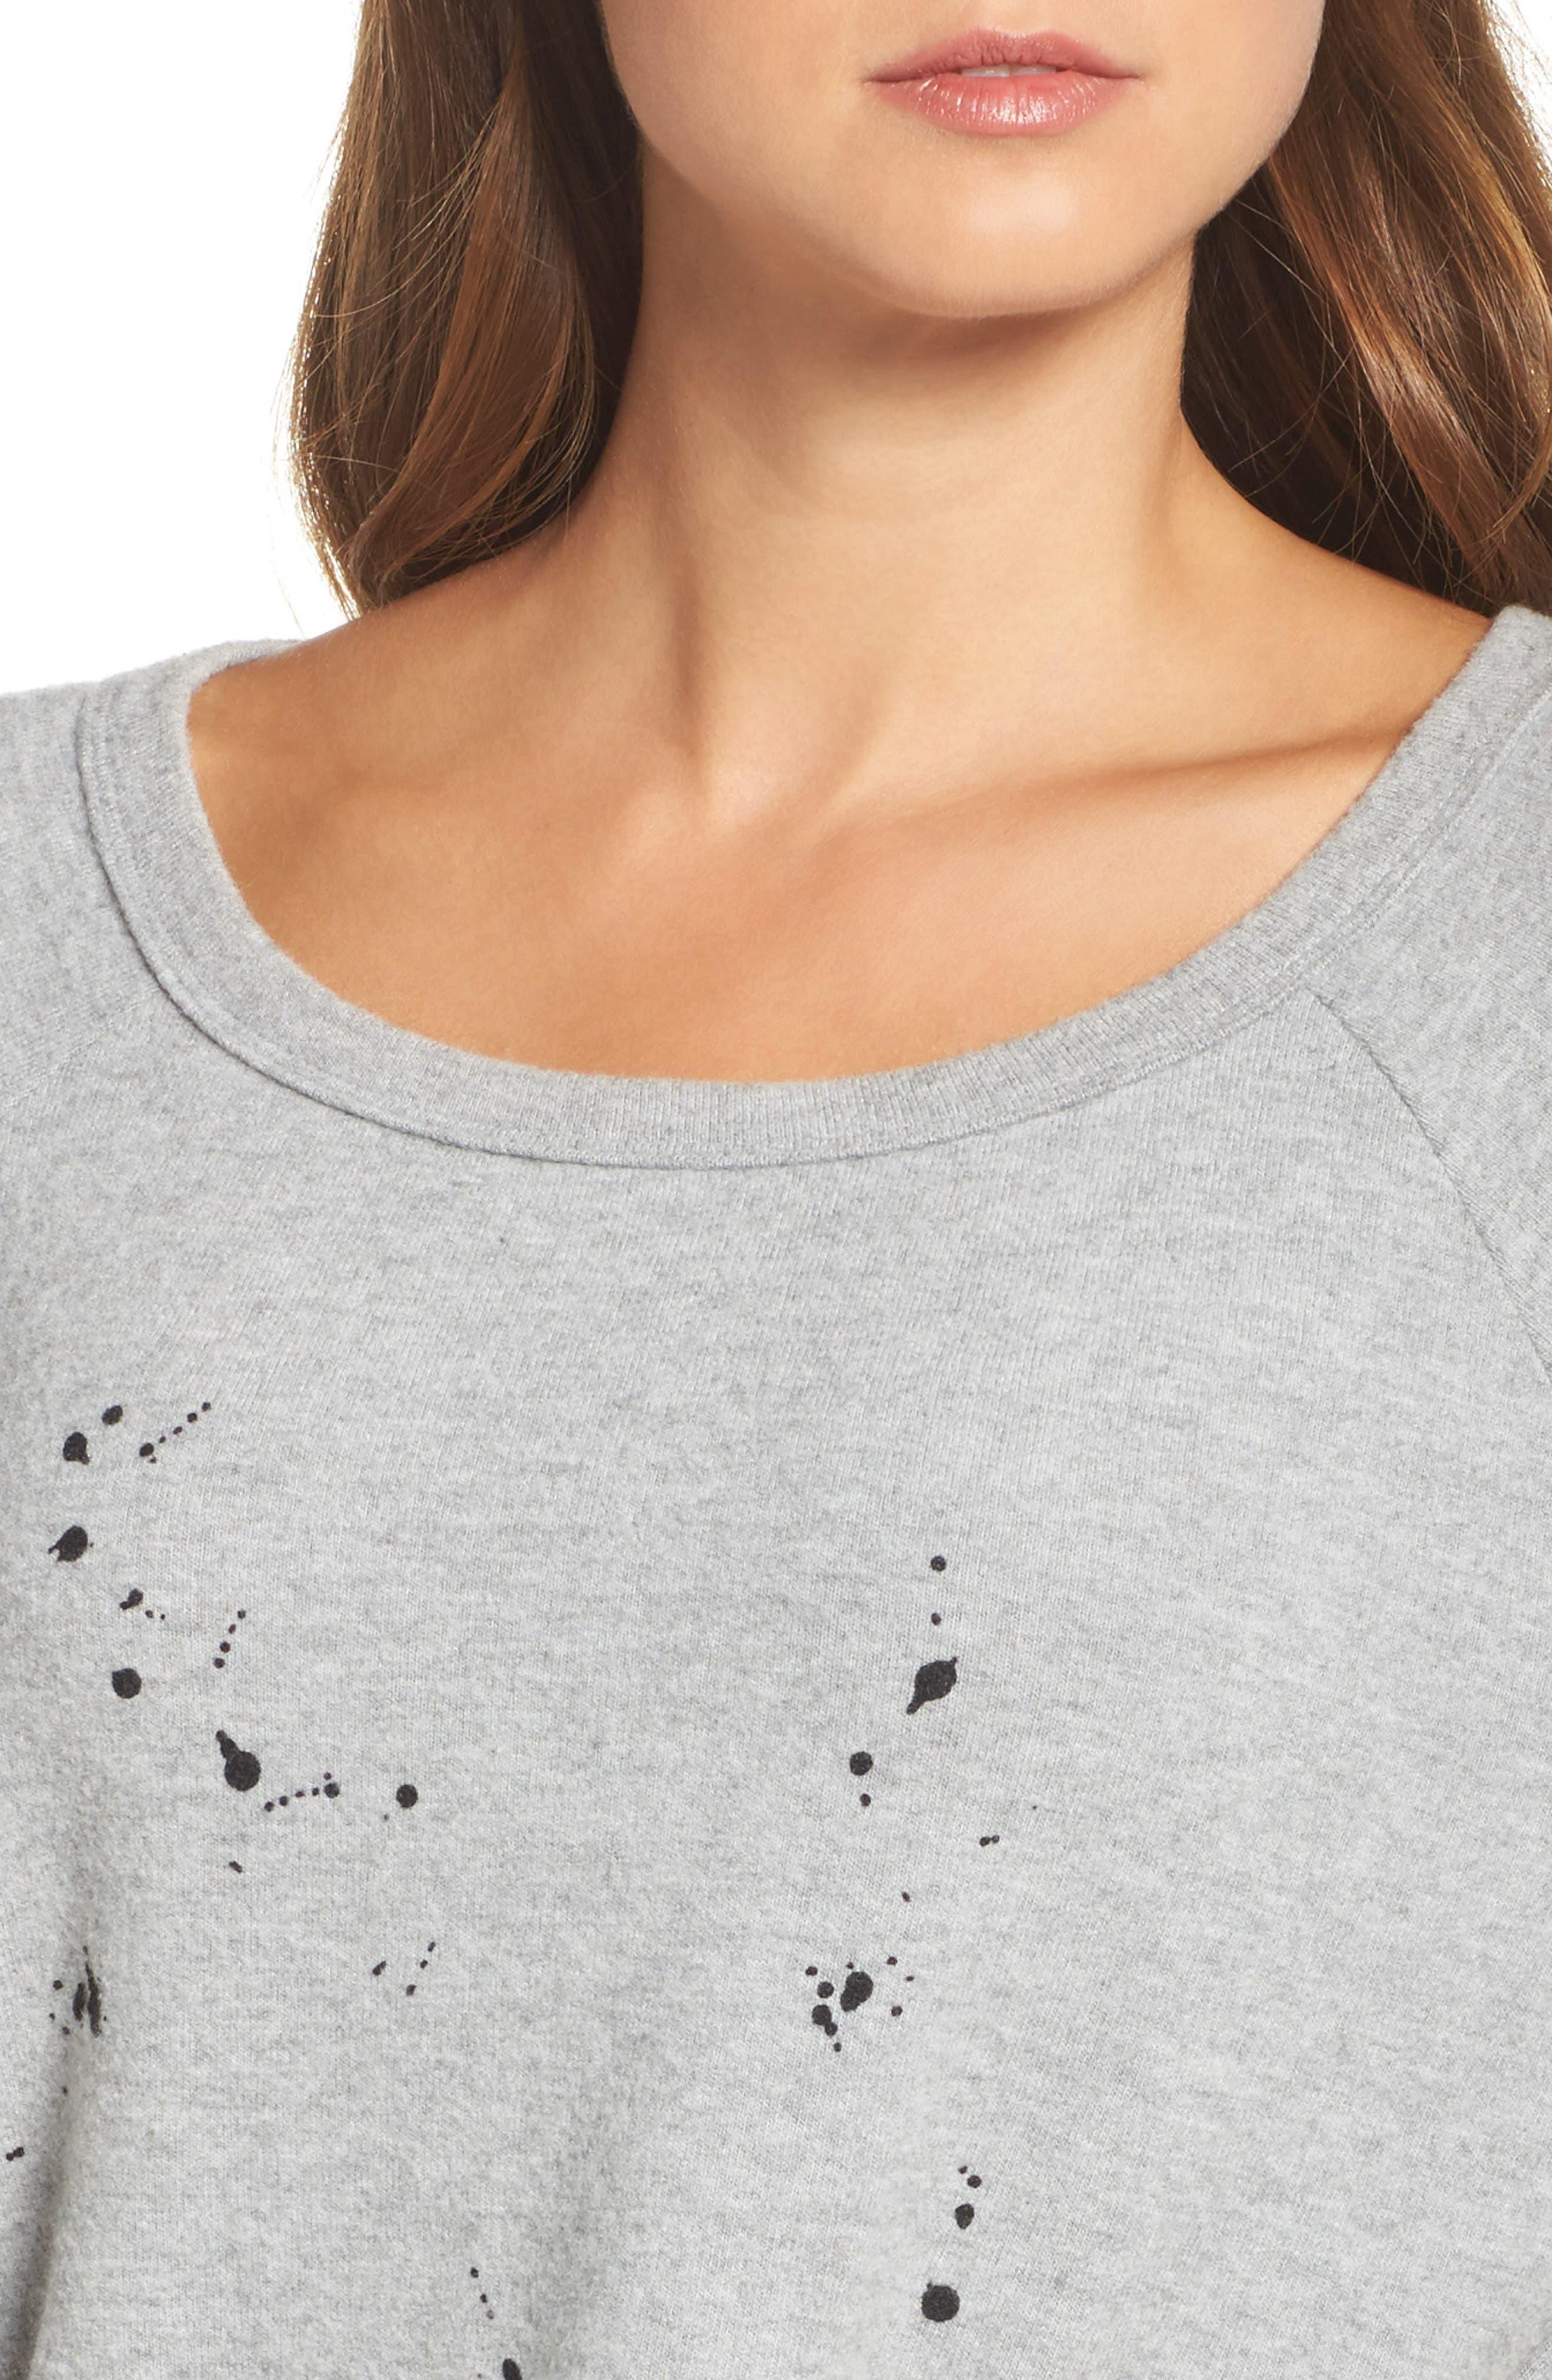 Kenny Splatter Lounge Sweatshirt,                             Alternate thumbnail 6, color,                             Heather Grey